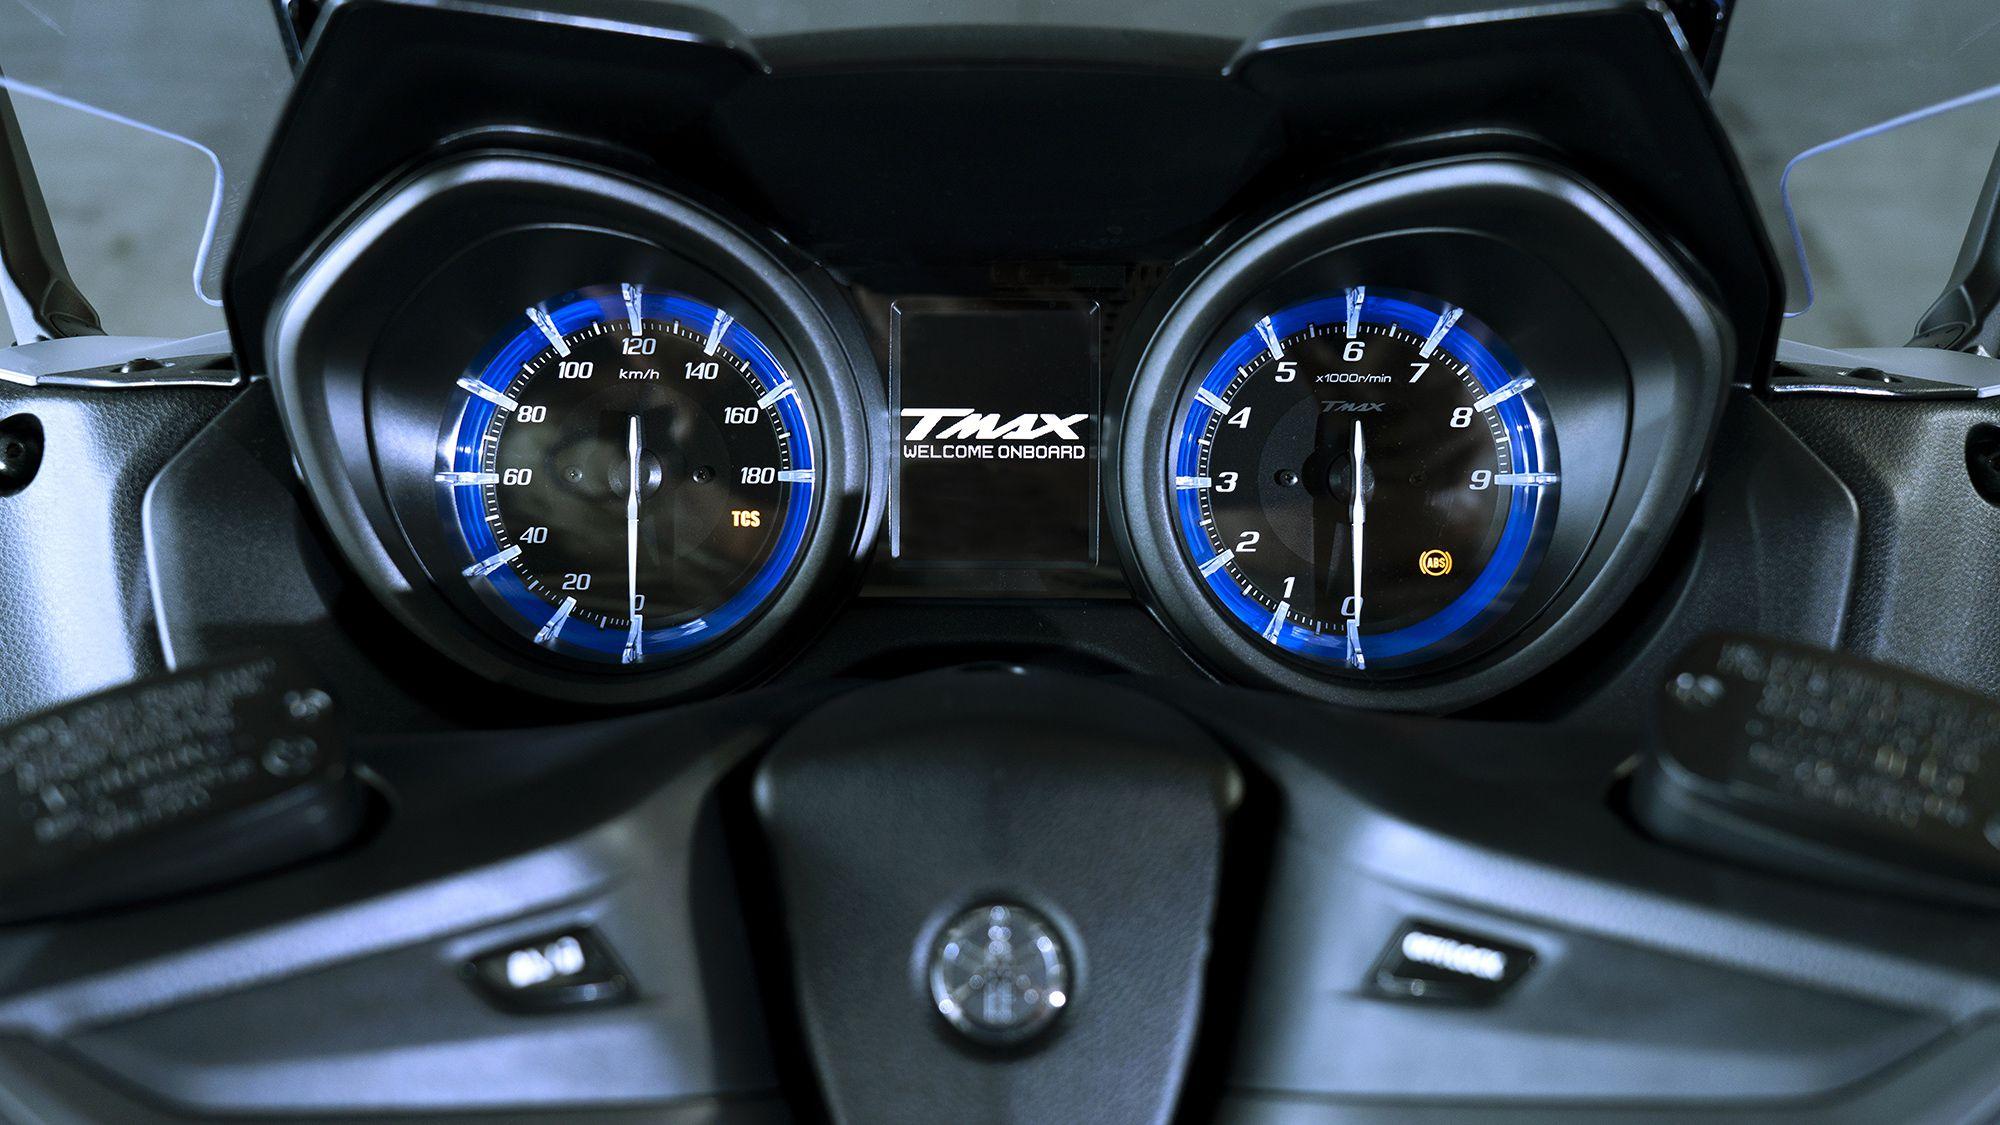 TMAX 560 instrument panel.